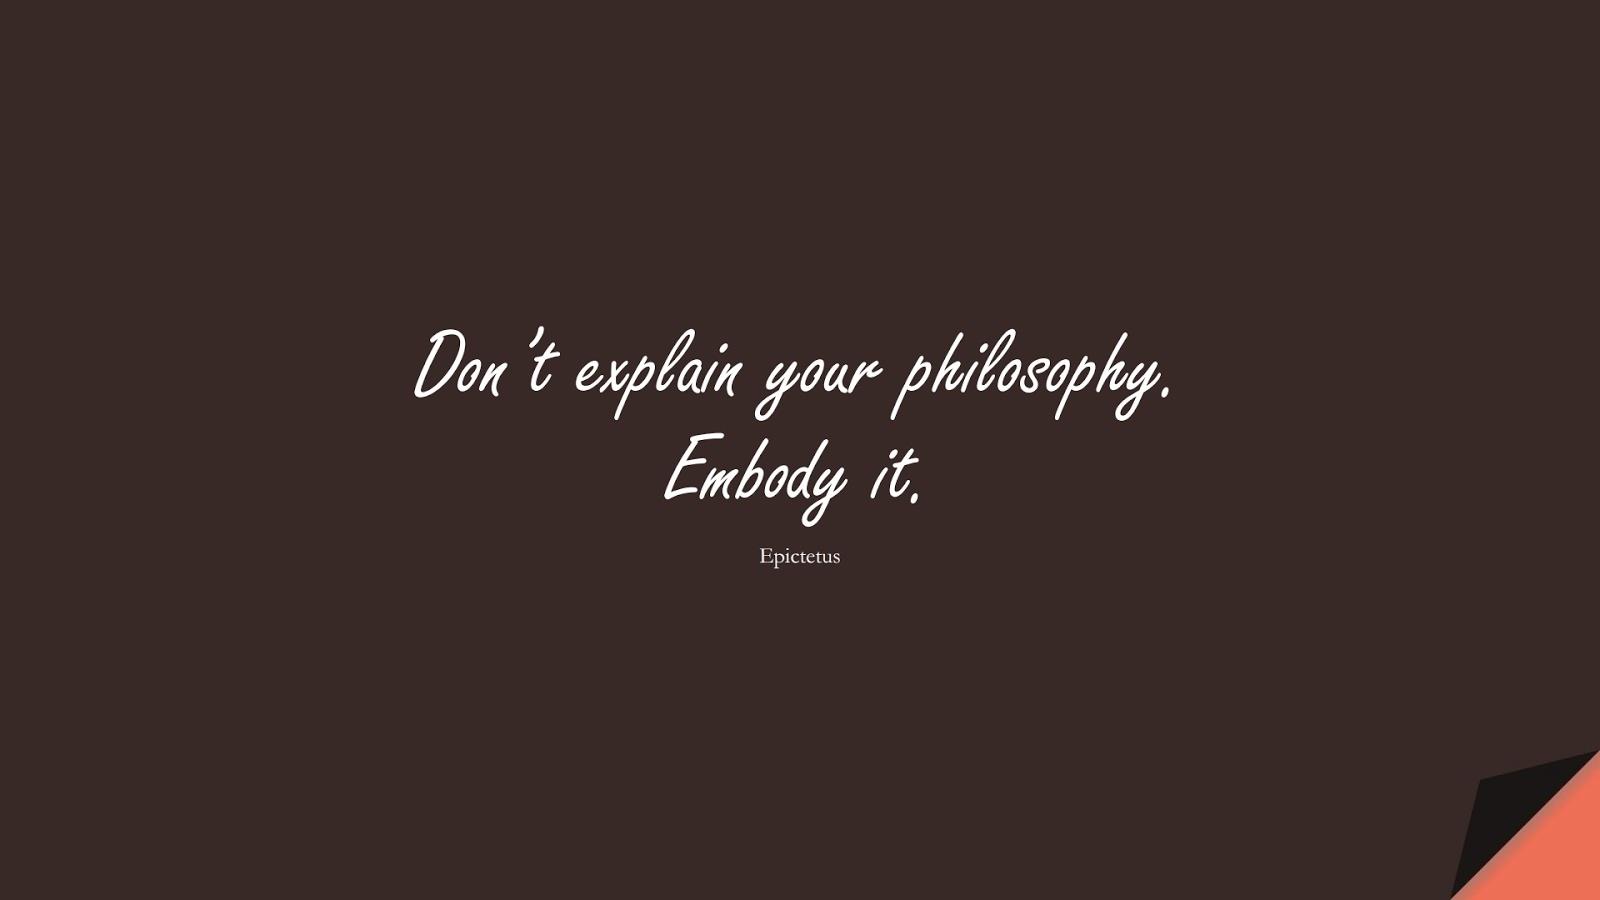 Don't explain your philosophy. Embody it. (Epictetus);  #CharacterQuotes